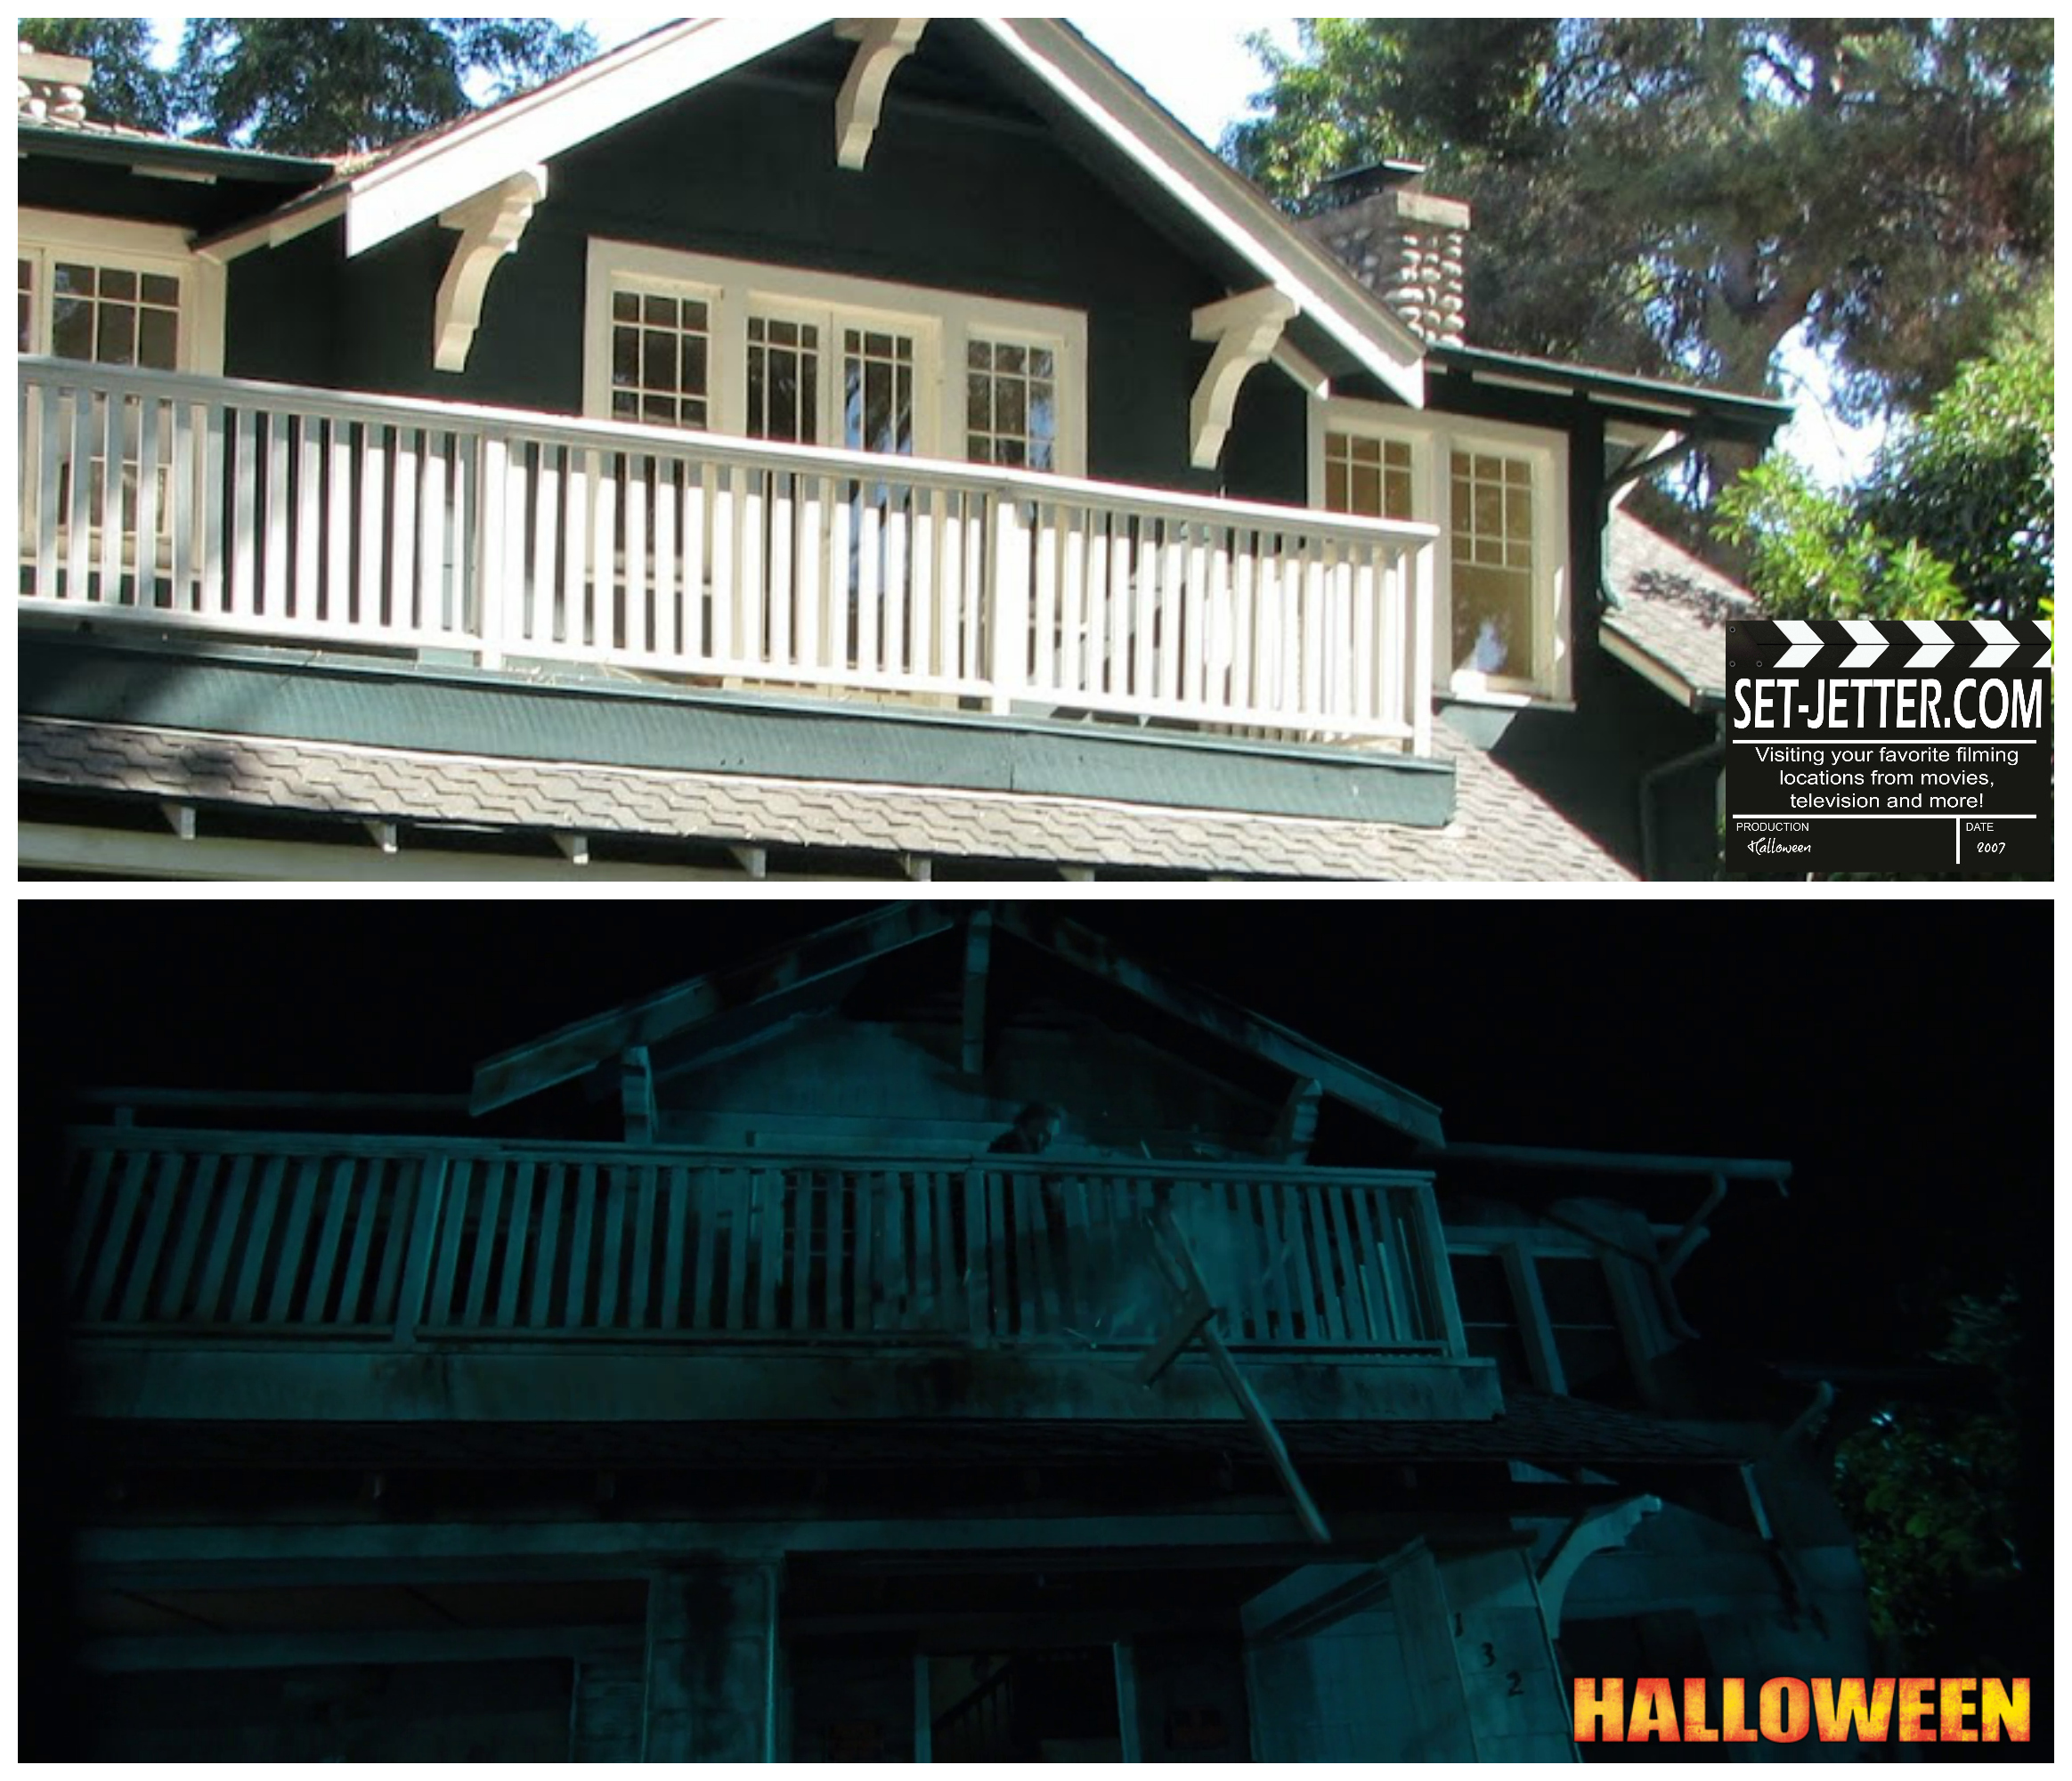 Halloween 2007 comparison 19.jpg